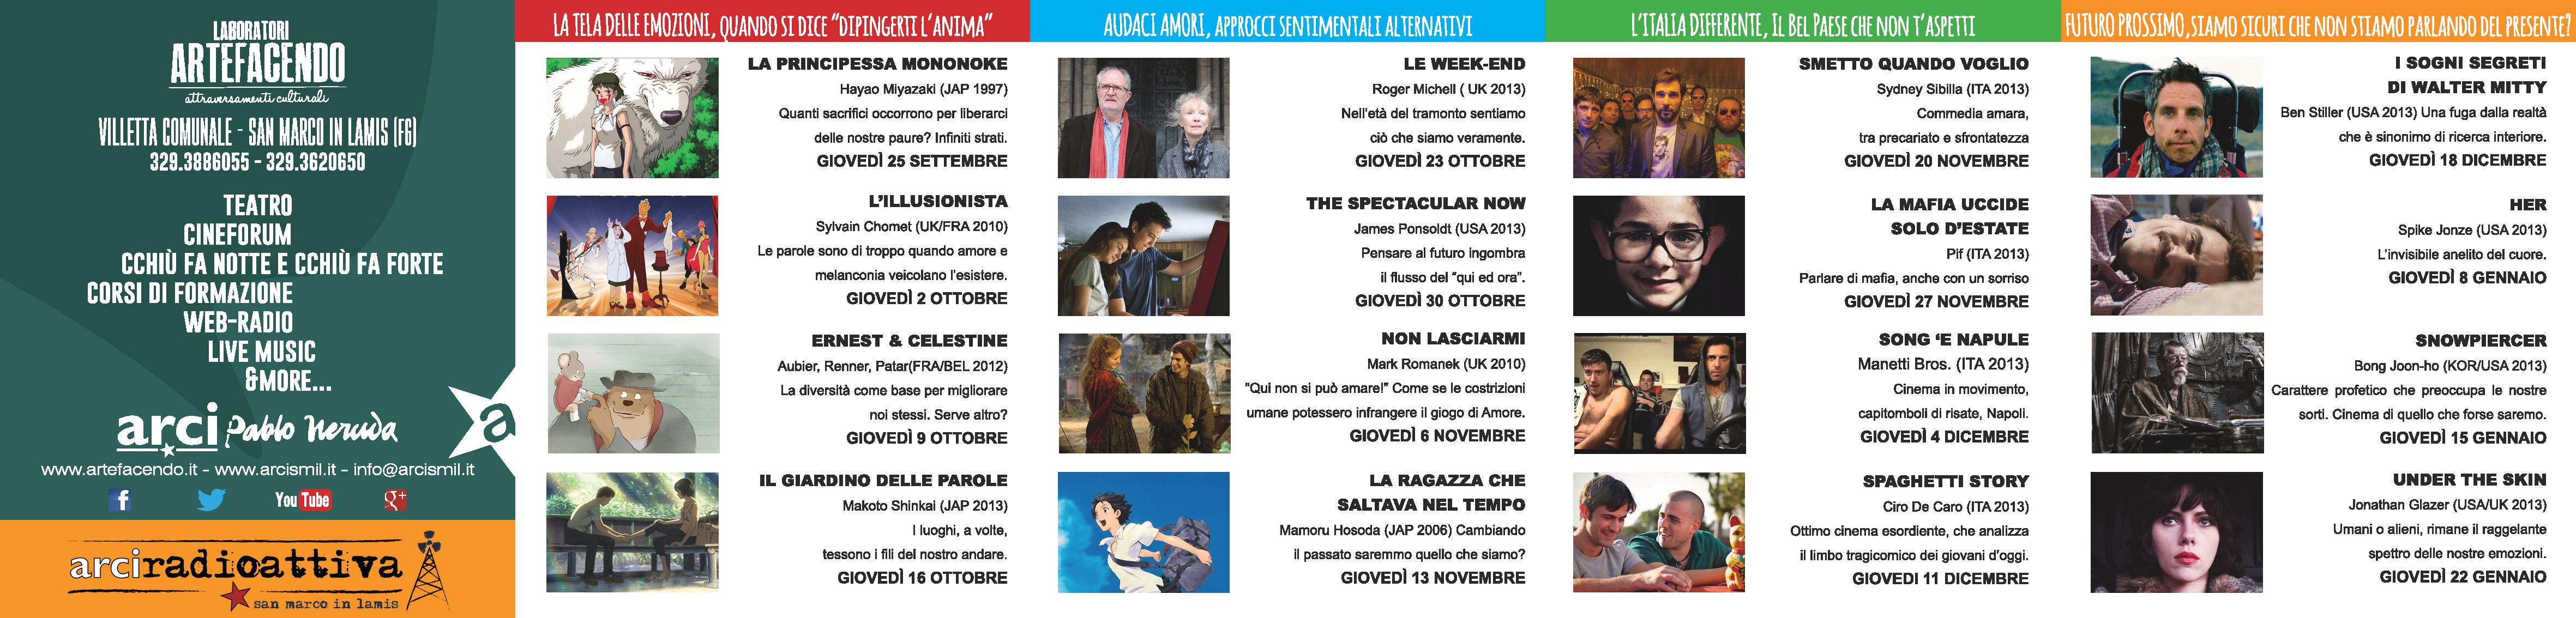 cineforum 2014-2015-page-002